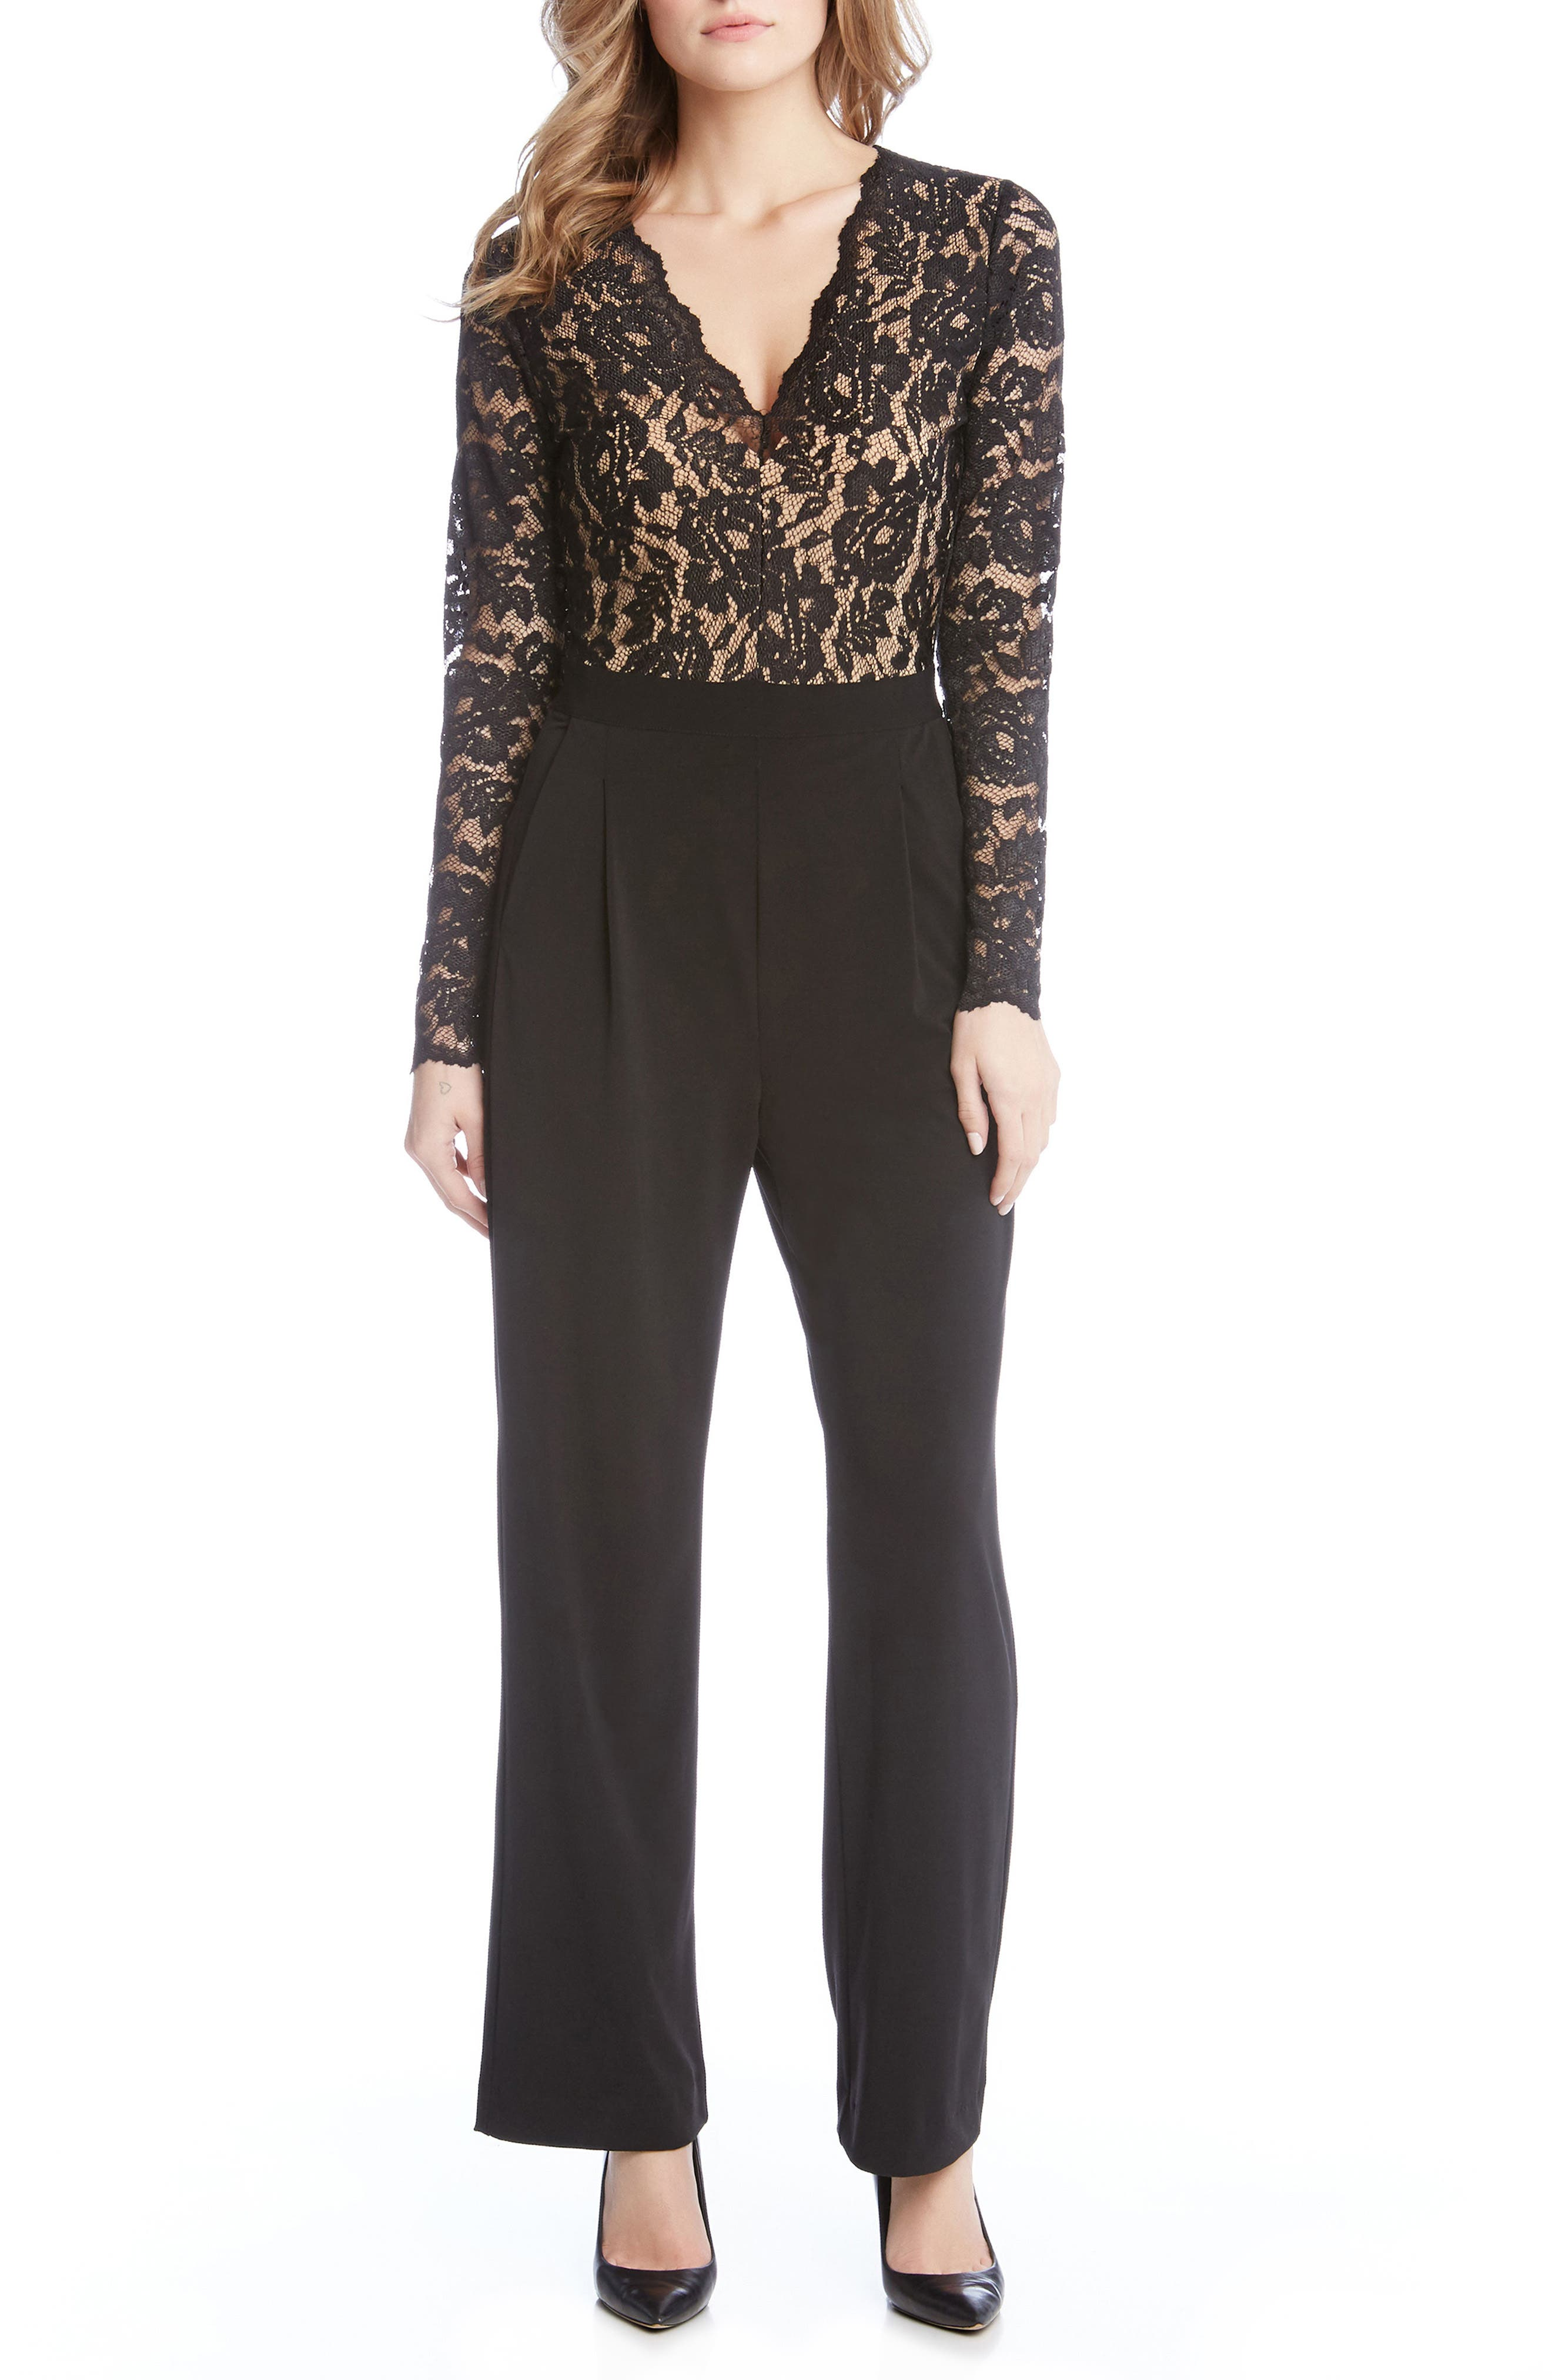 Karen Kane Ava Lace & Knit Jumpsuit